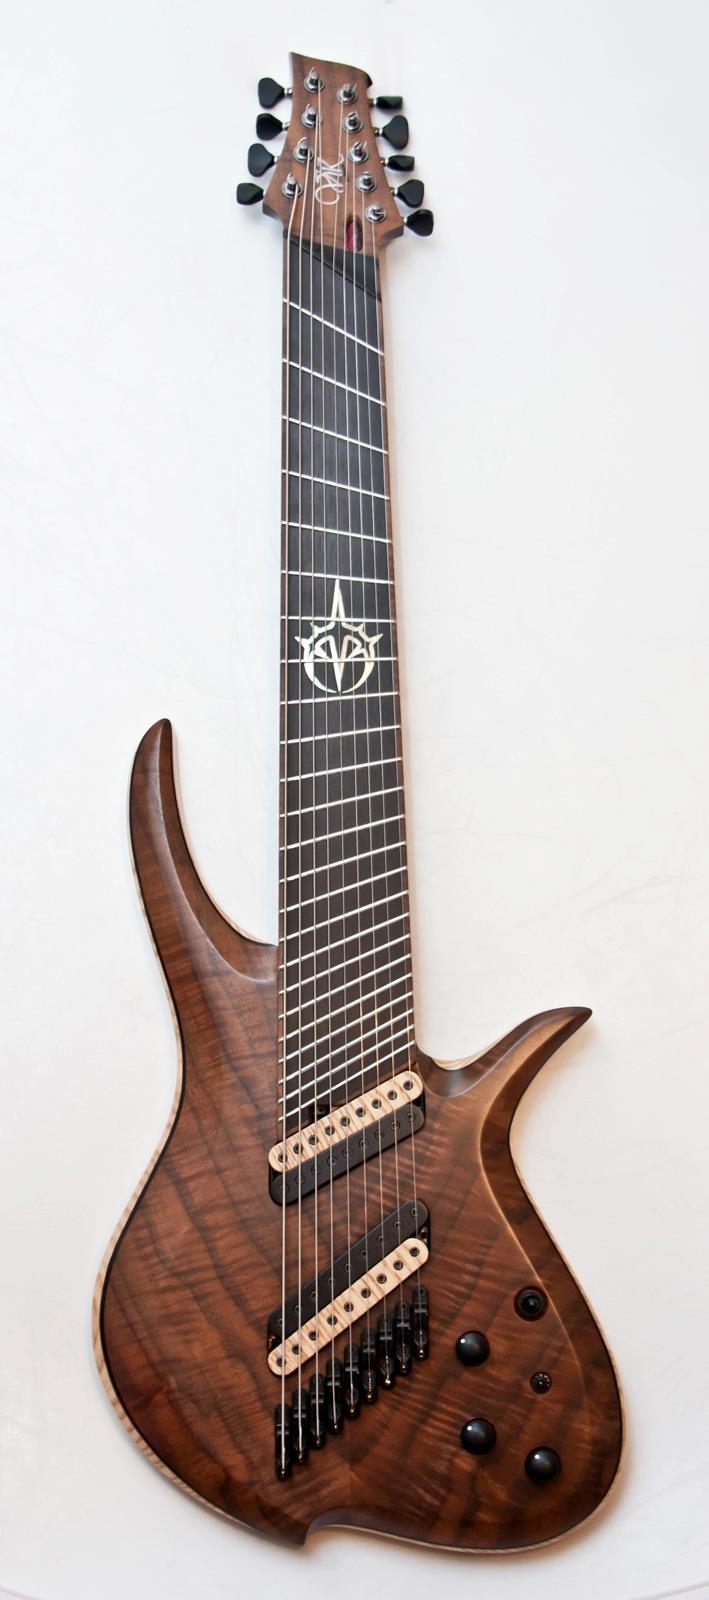 12 best 9 string guitars and beyond images on pinterest guitars instruments and bass. Black Bedroom Furniture Sets. Home Design Ideas